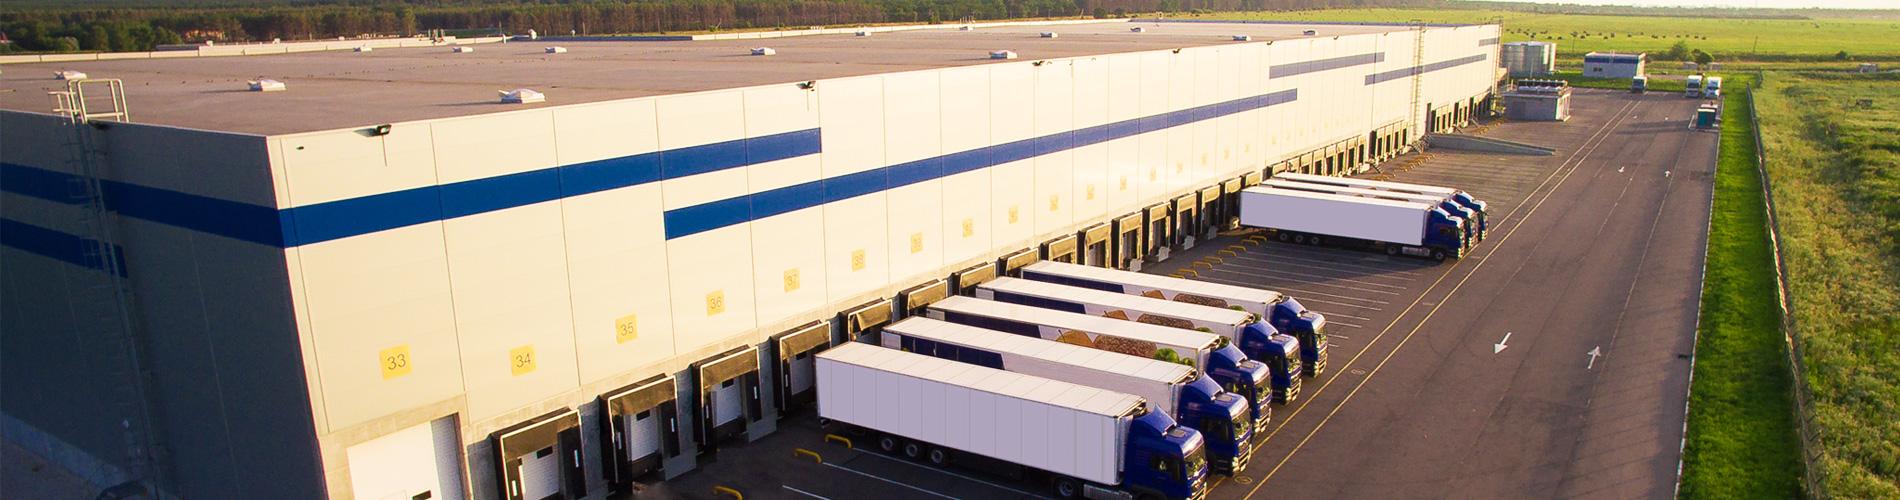 Logistic Center in Georgia